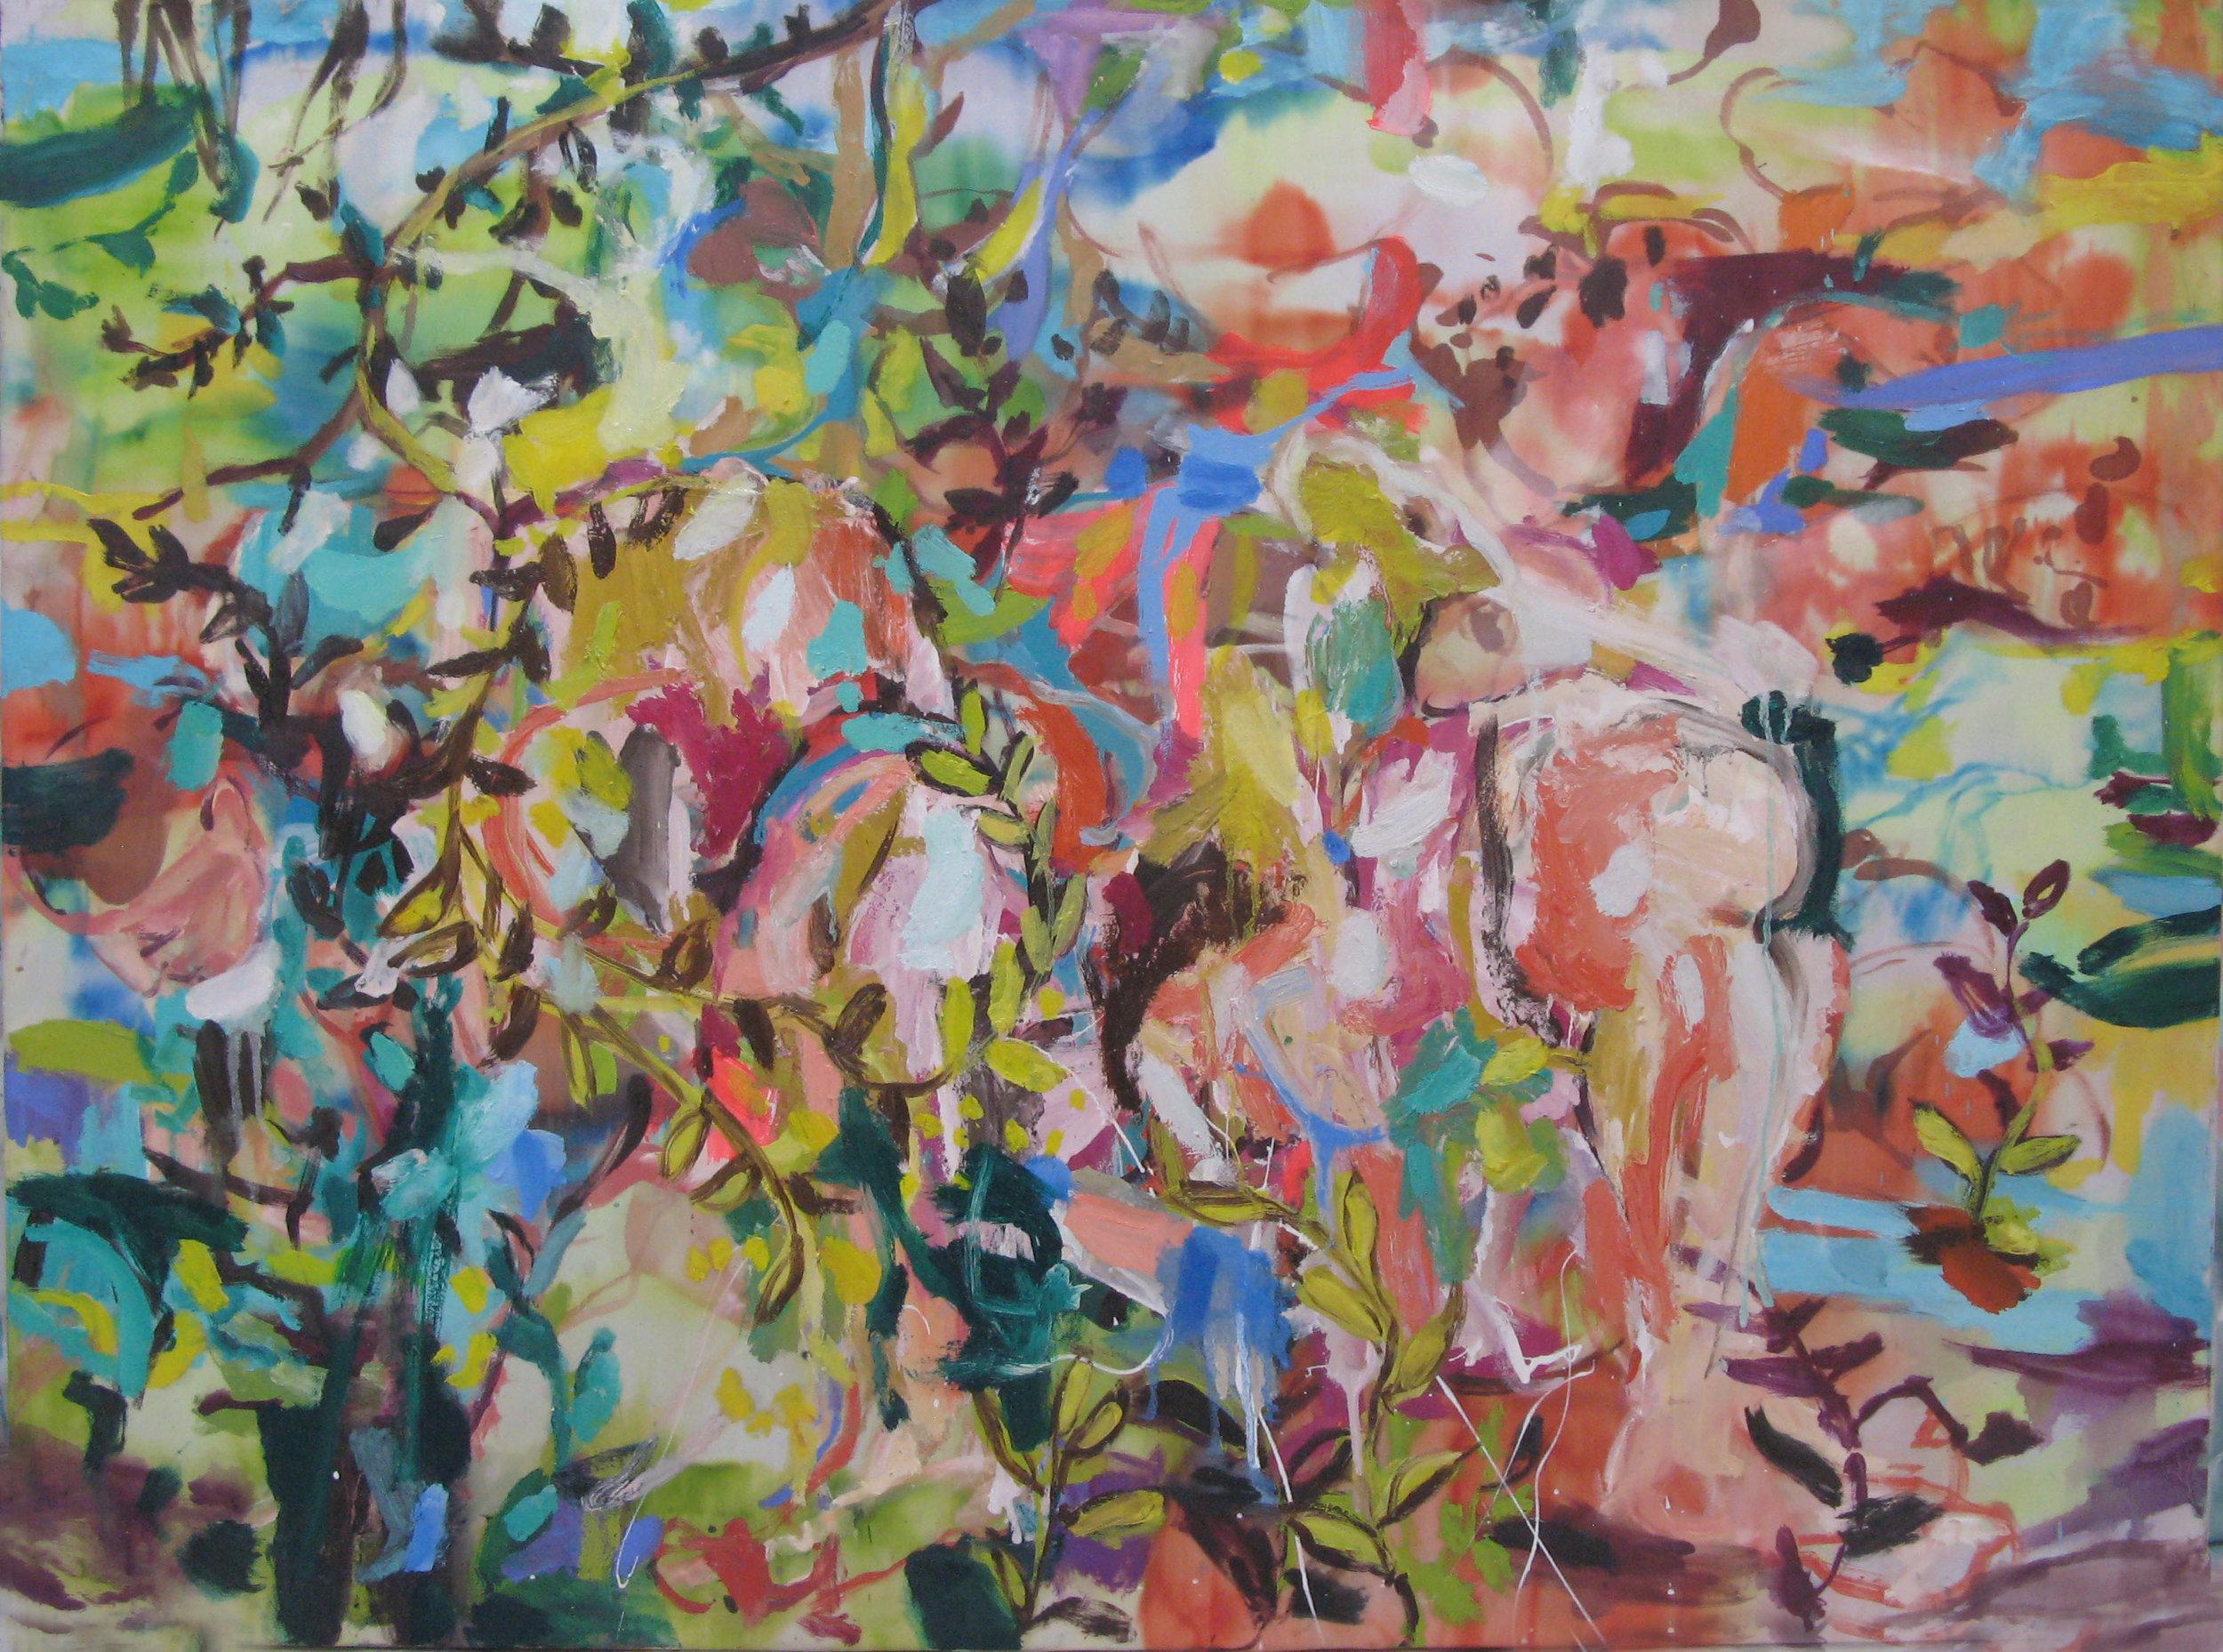 ID Life Tapestries No 3, 120x90cm, mixed media on silk, 2018